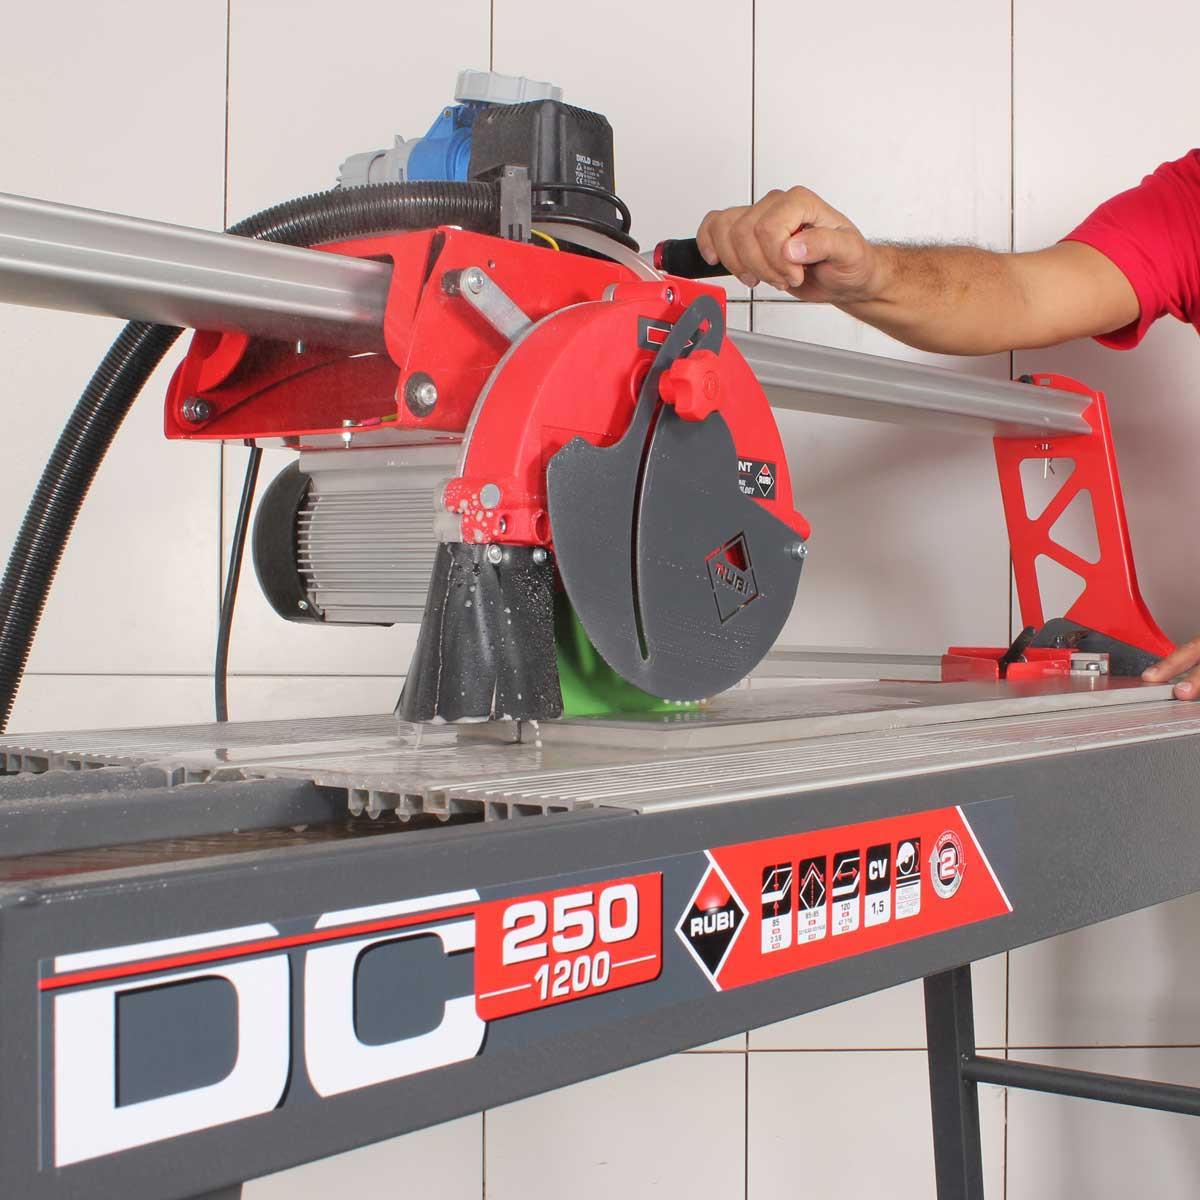 Rubi DC250-1200 rail saw handle